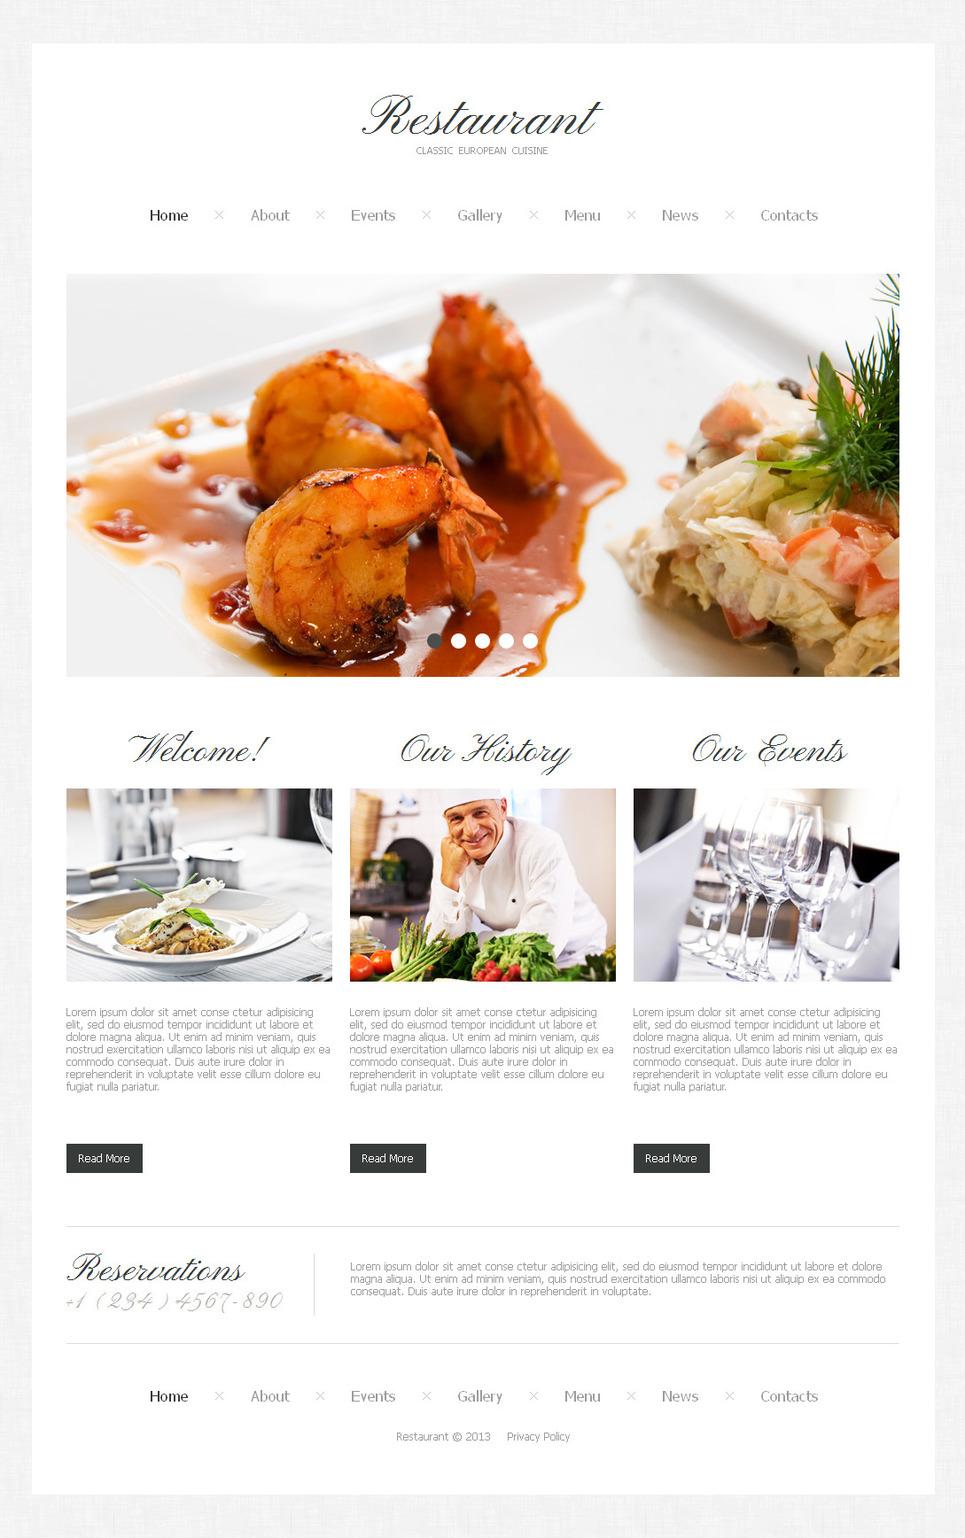 Restaurant Website Template for Classic European Cuisine Lovers - image